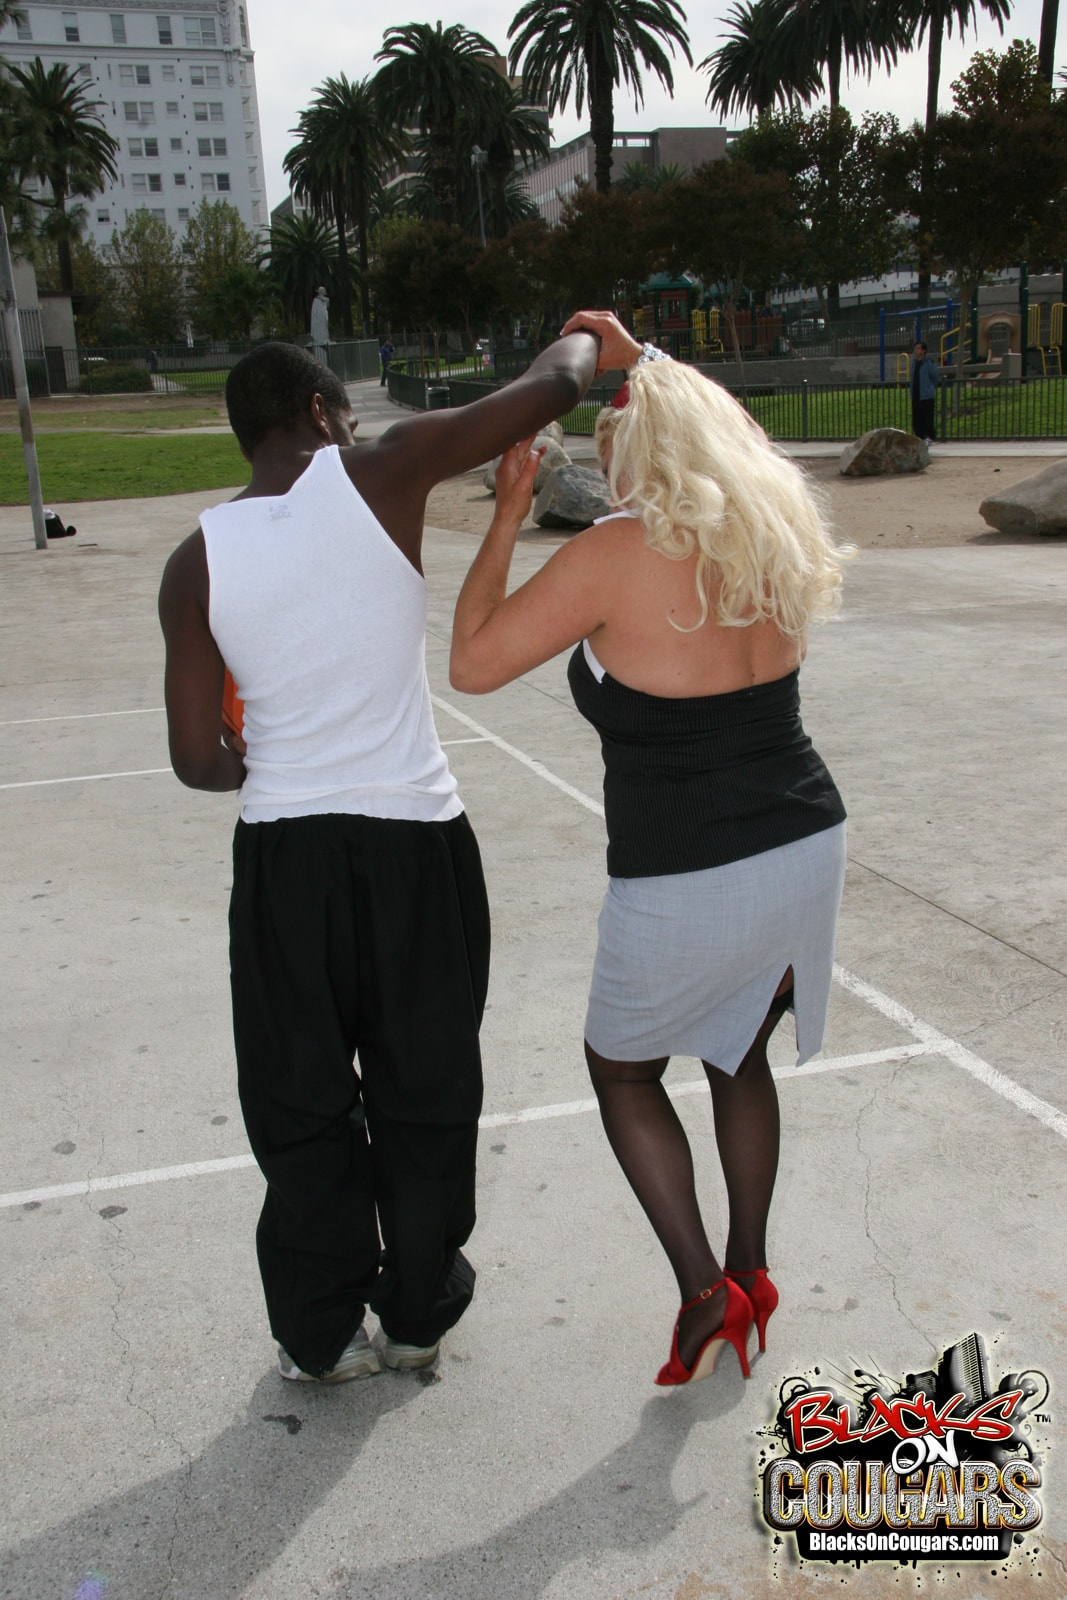 Dogfart '- Blacks On Cougars' starring Dana Hayes (Photo 6)